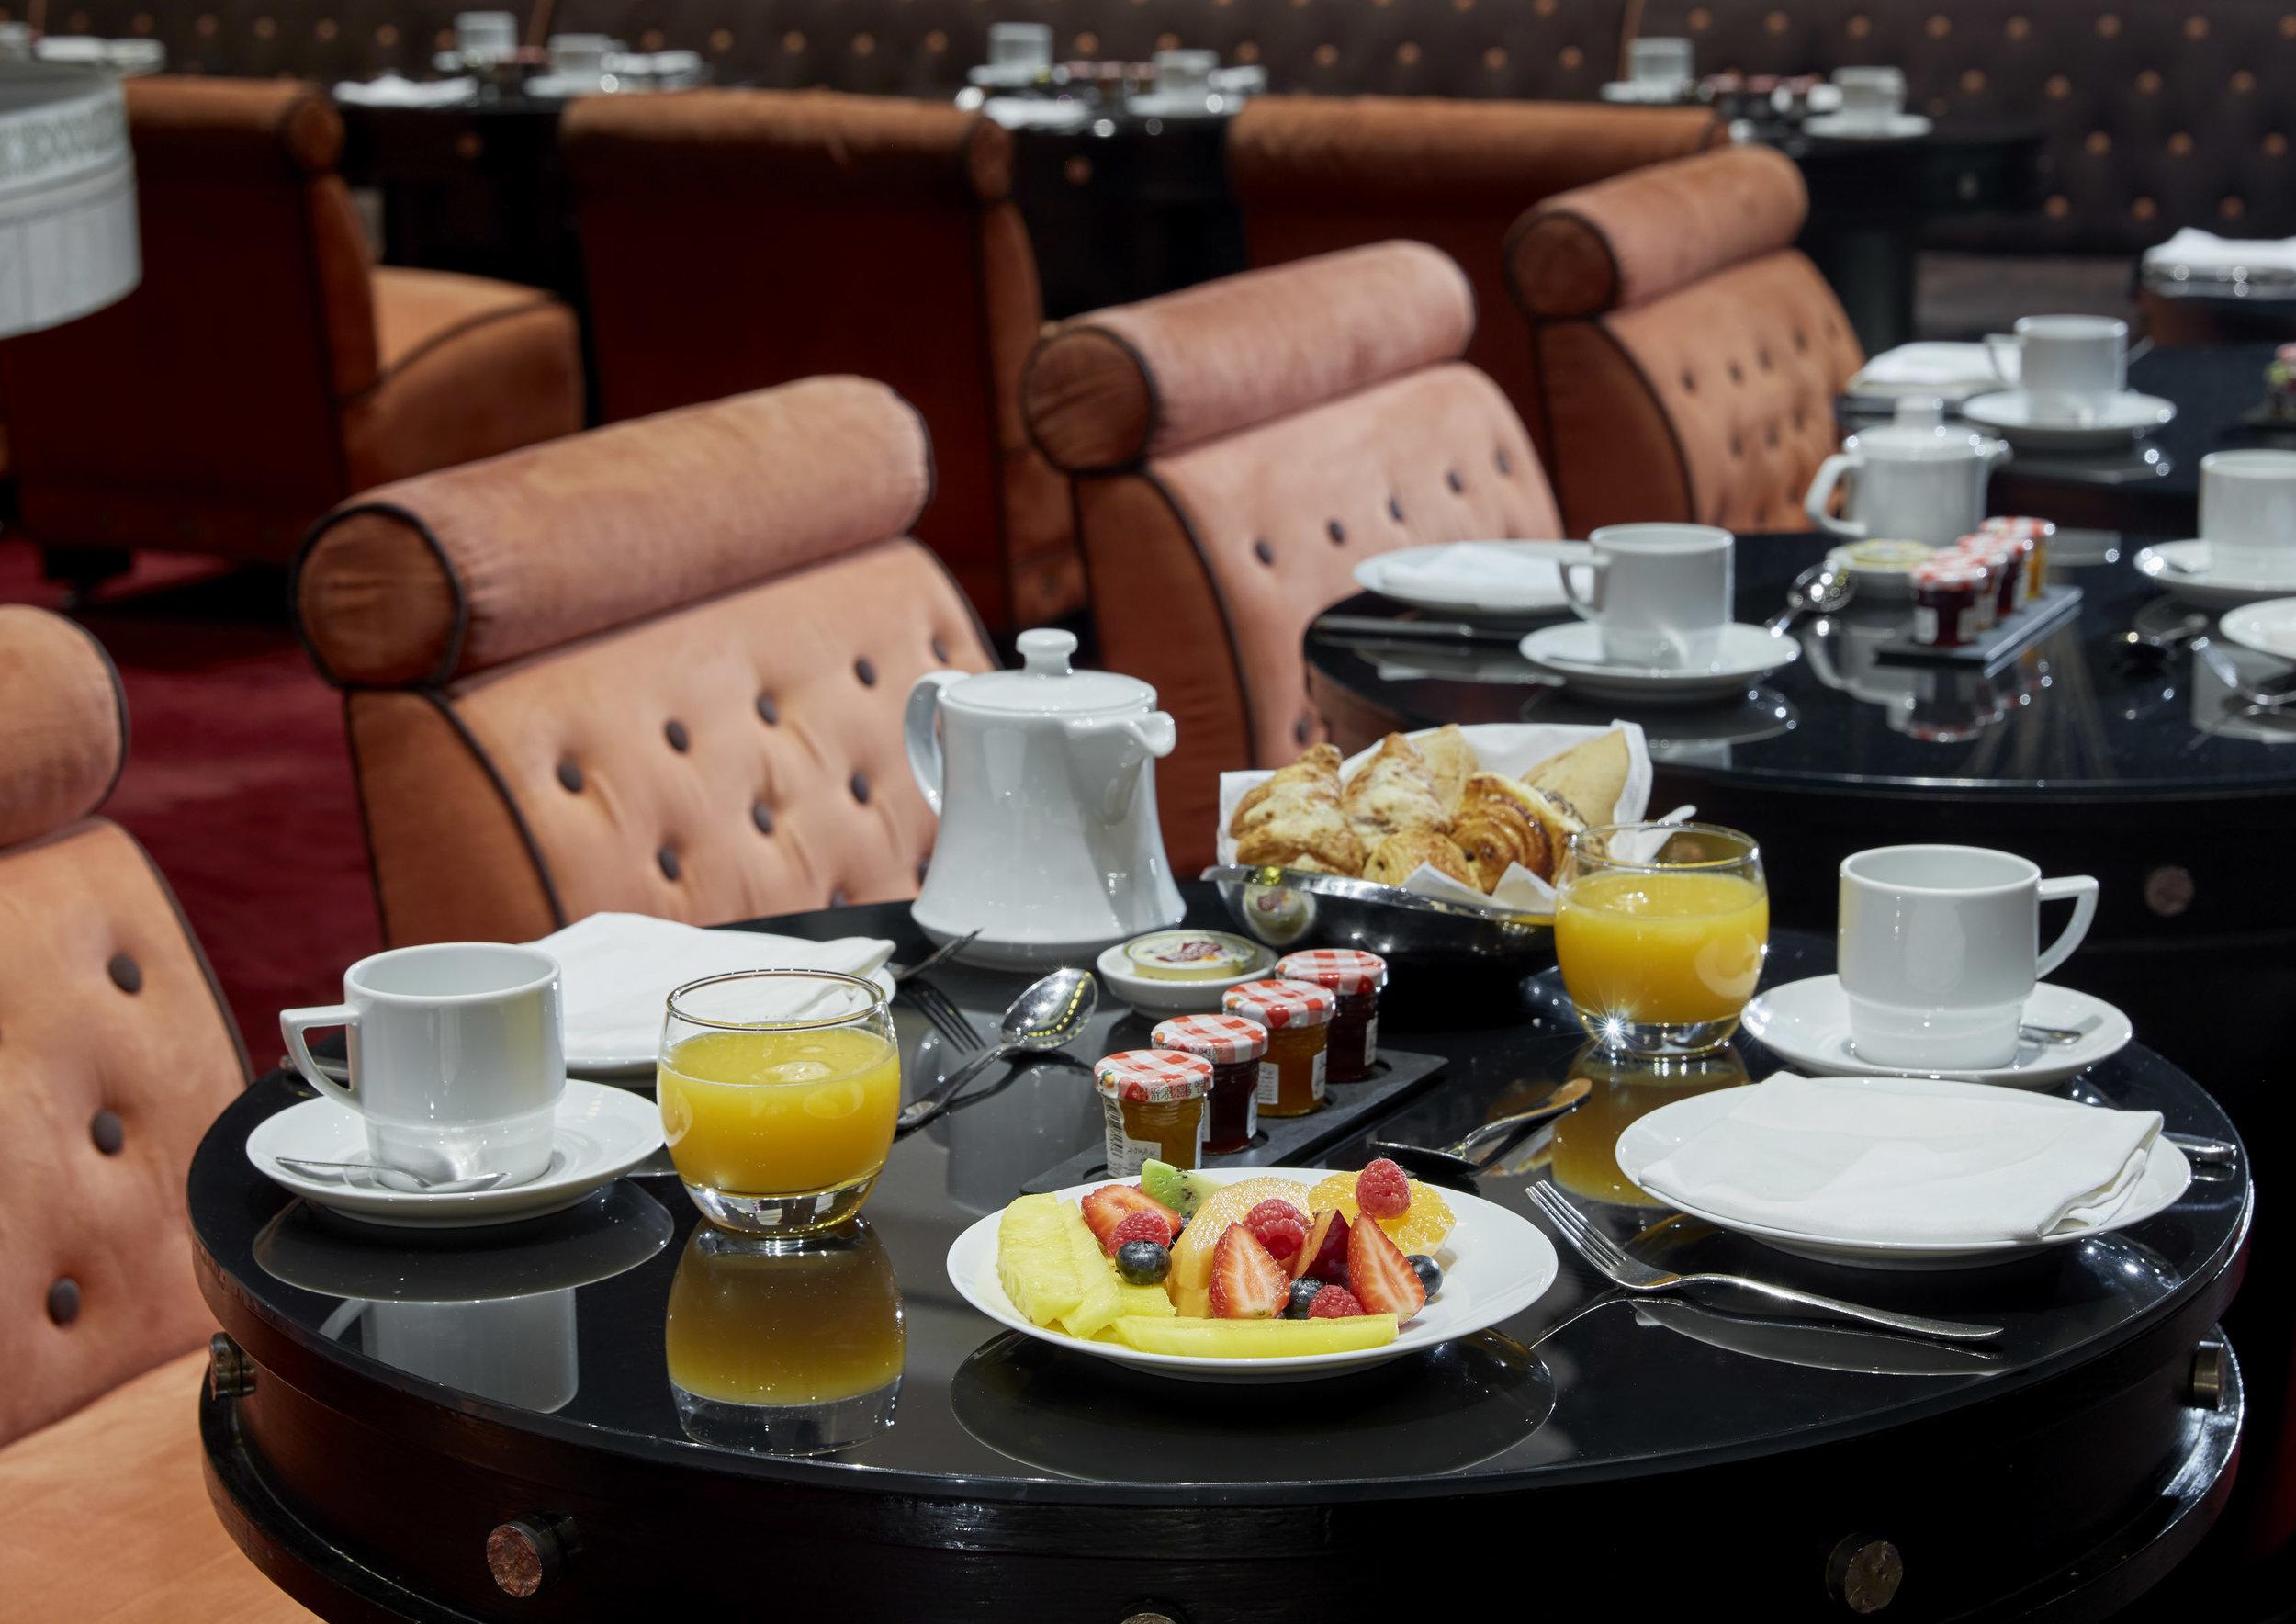 Bissat_Breakfast_Table_Setup.jpg